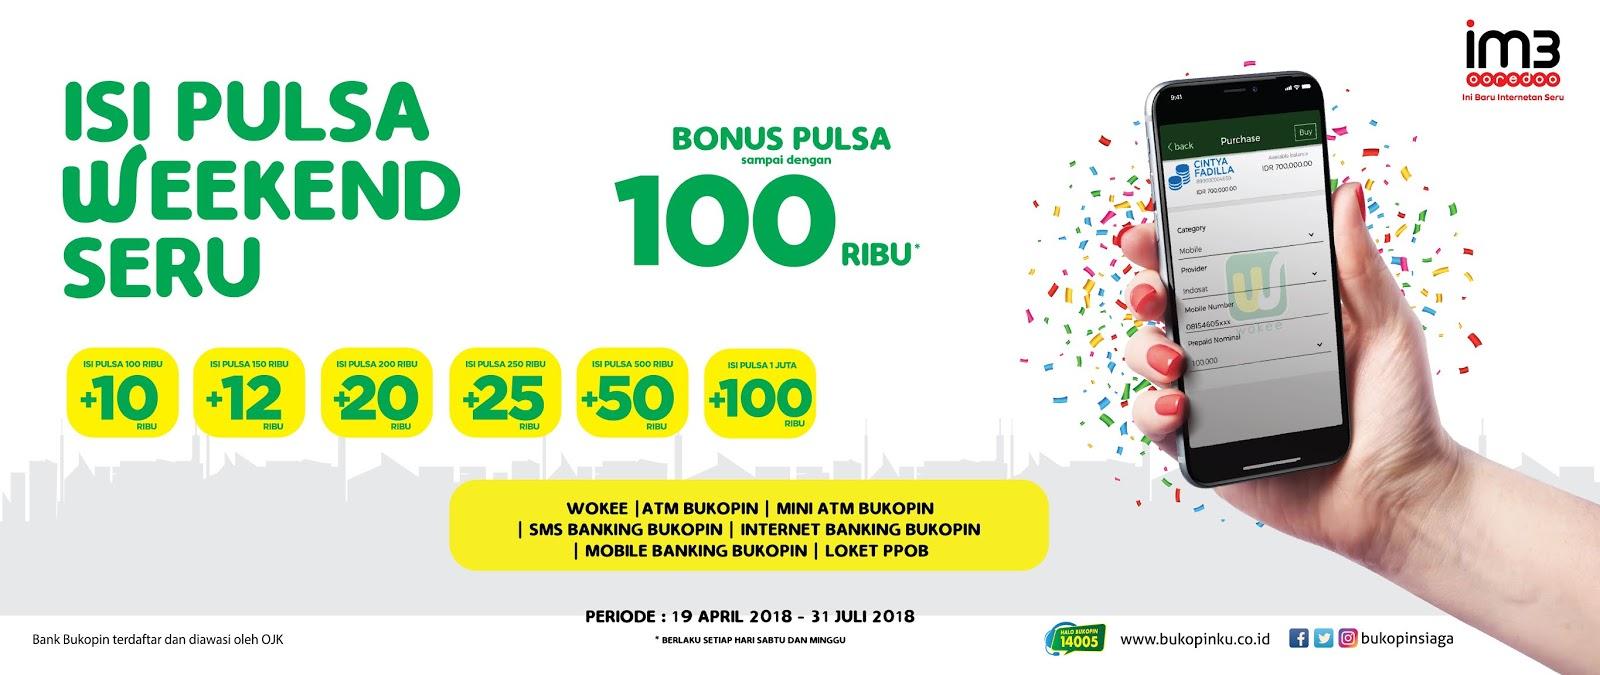 Bank Bukopin - Promo IM3 OoRedoo Weekend Seru Bonus Pulsa (s.d 31 Juli 2018)